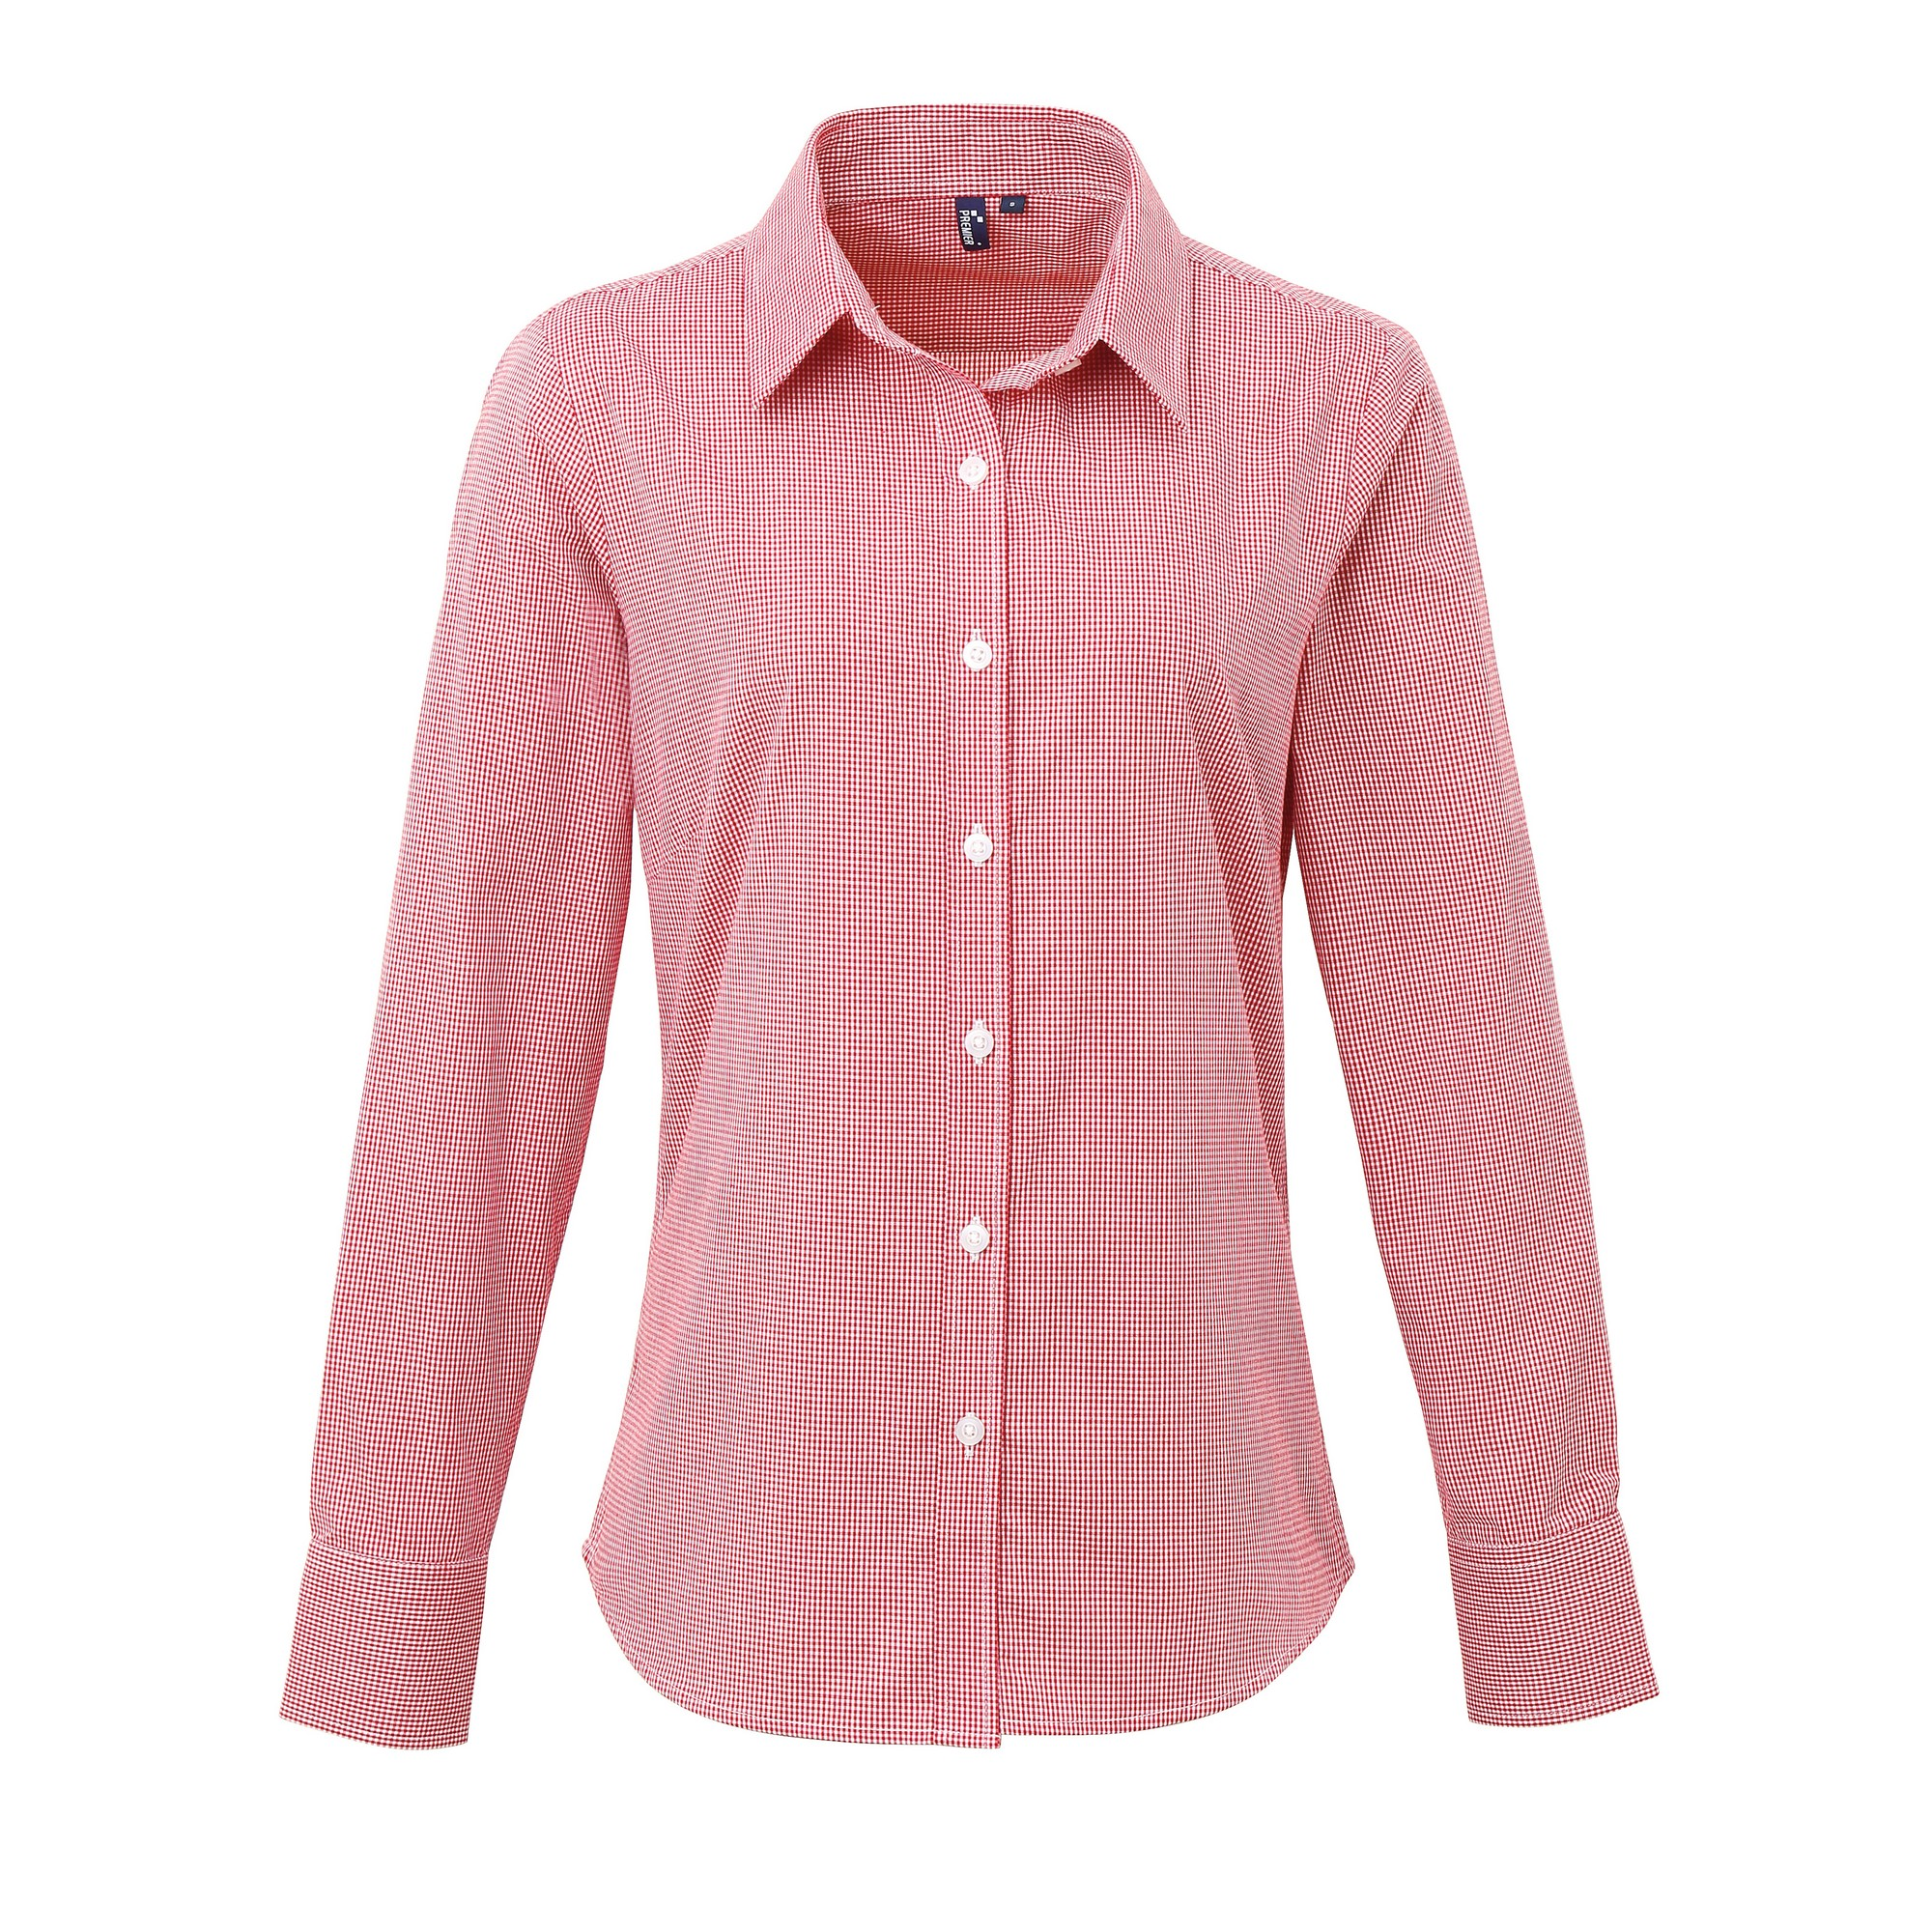 Premier Womens/Ladies Microcheck Long Sleeve Shirt (XL) (Red/White)